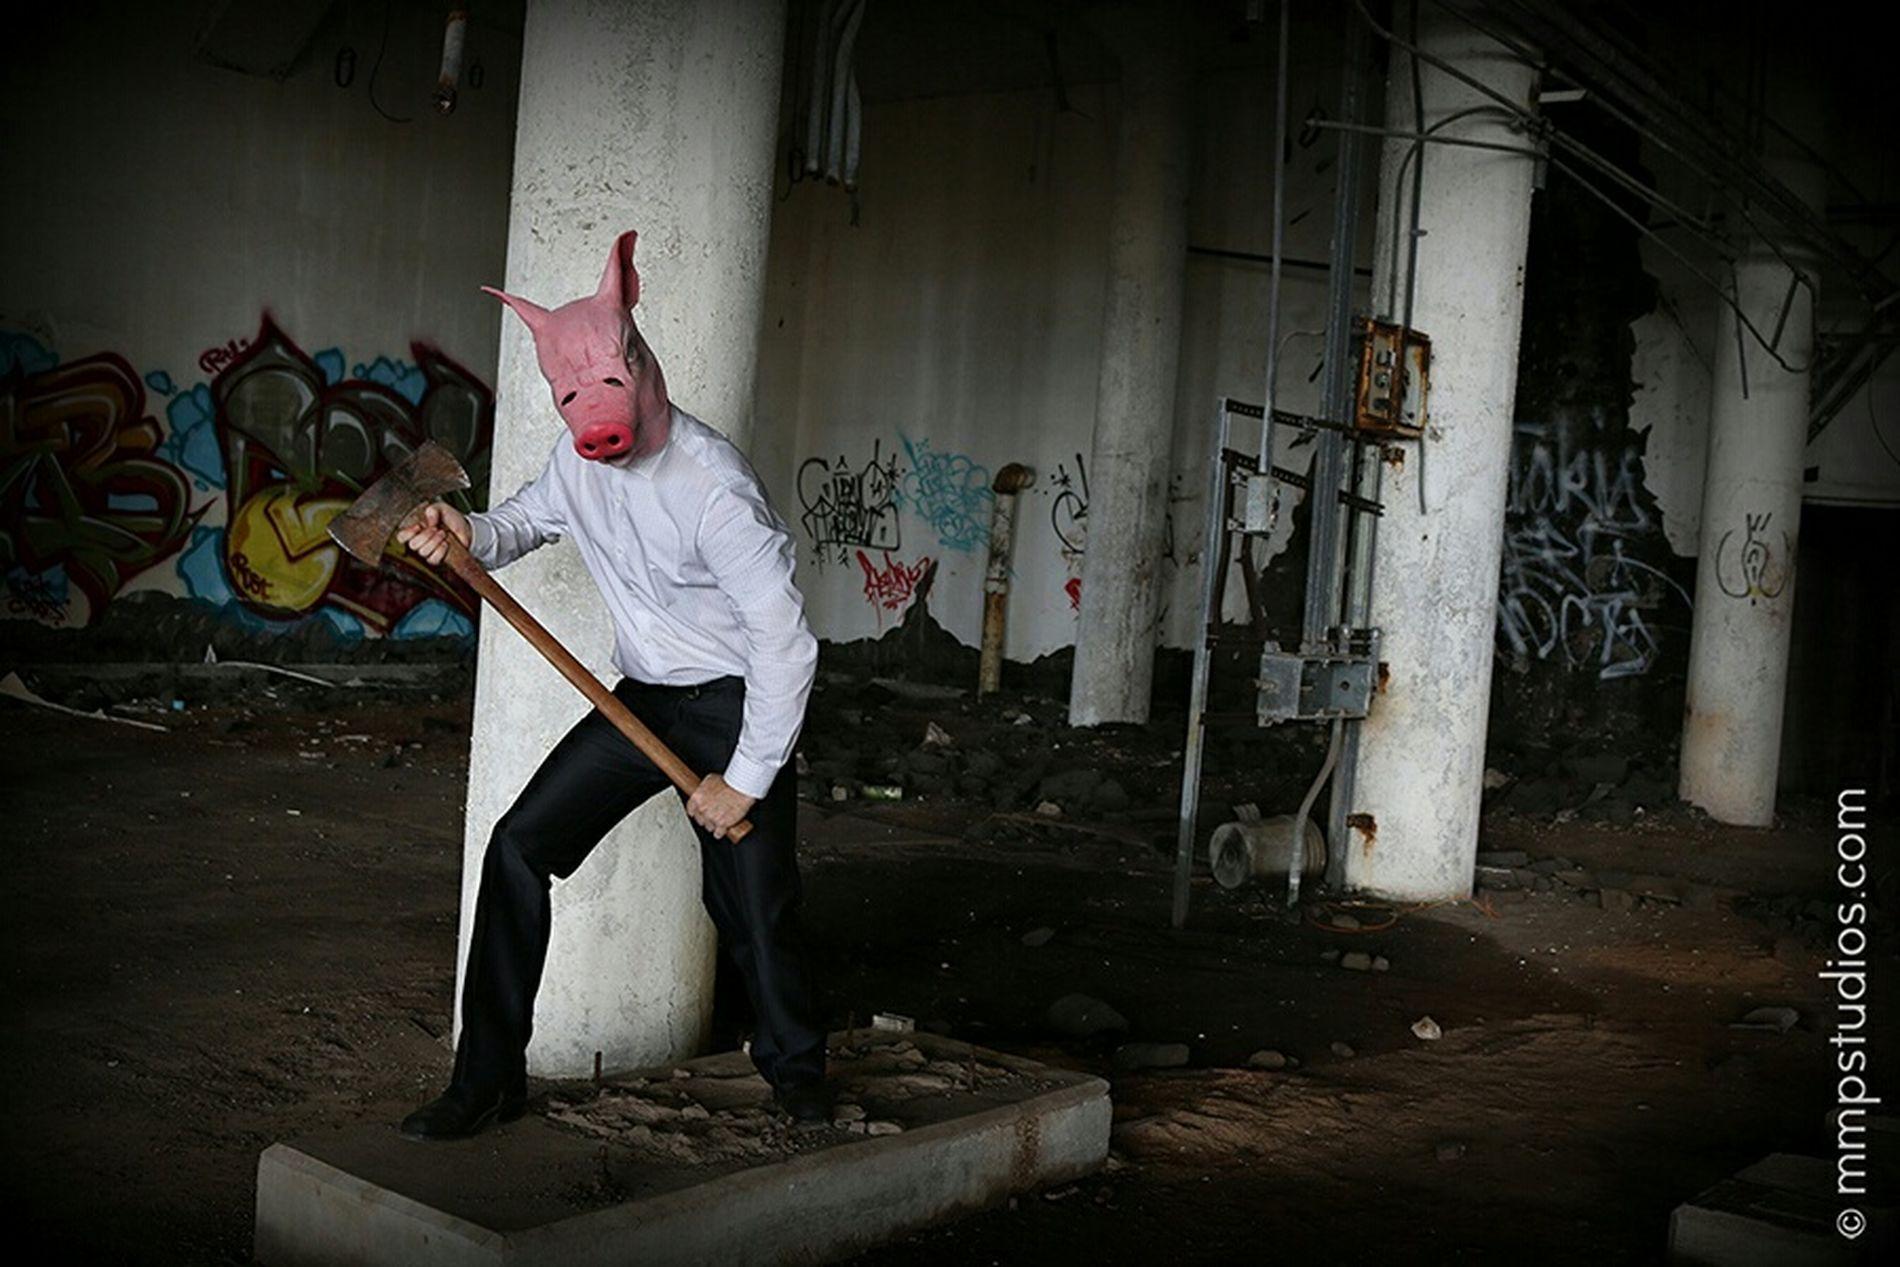 @melvinmaya @mmpstudios_com Photography Photoshoot Masked Pig Mask Axe Warehouse Abandoned Building Graffiti Creepy Eerie Random People Galveston Texas Followme